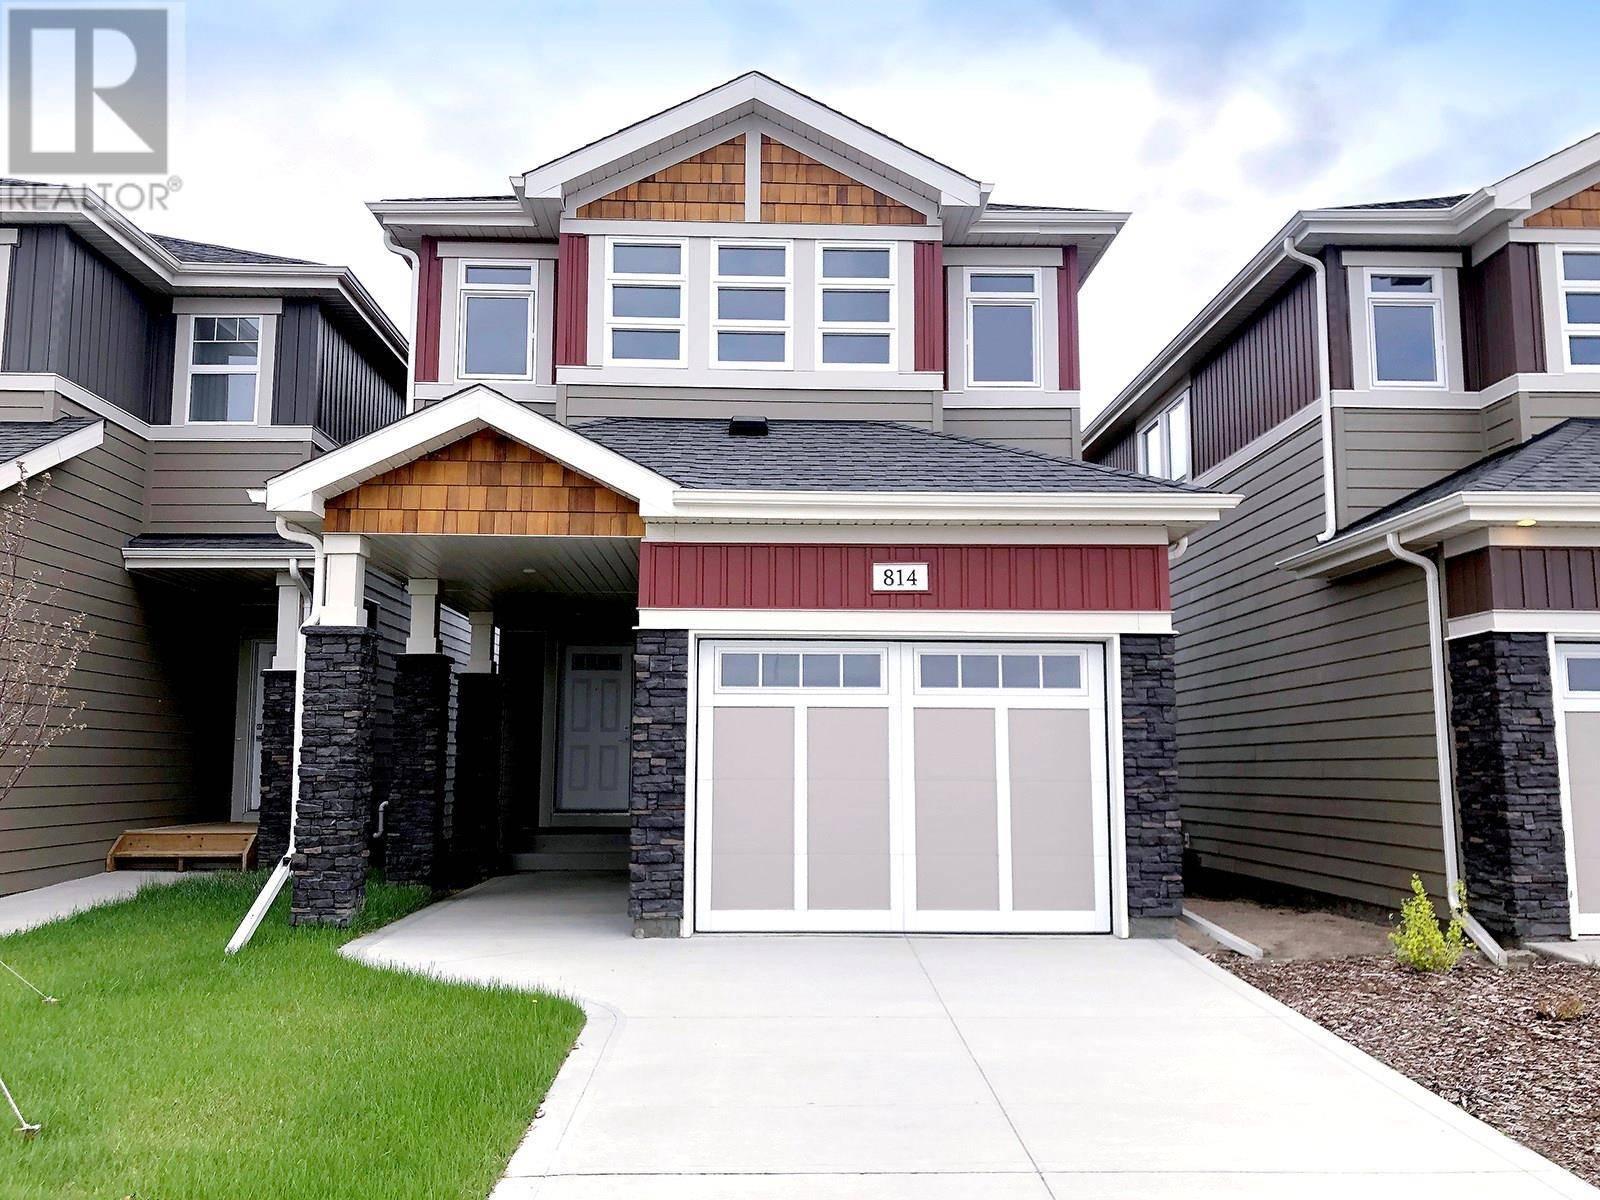 House for sale at 814 Kensington Blvd Saskatoon Saskatchewan - MLS: SK783002